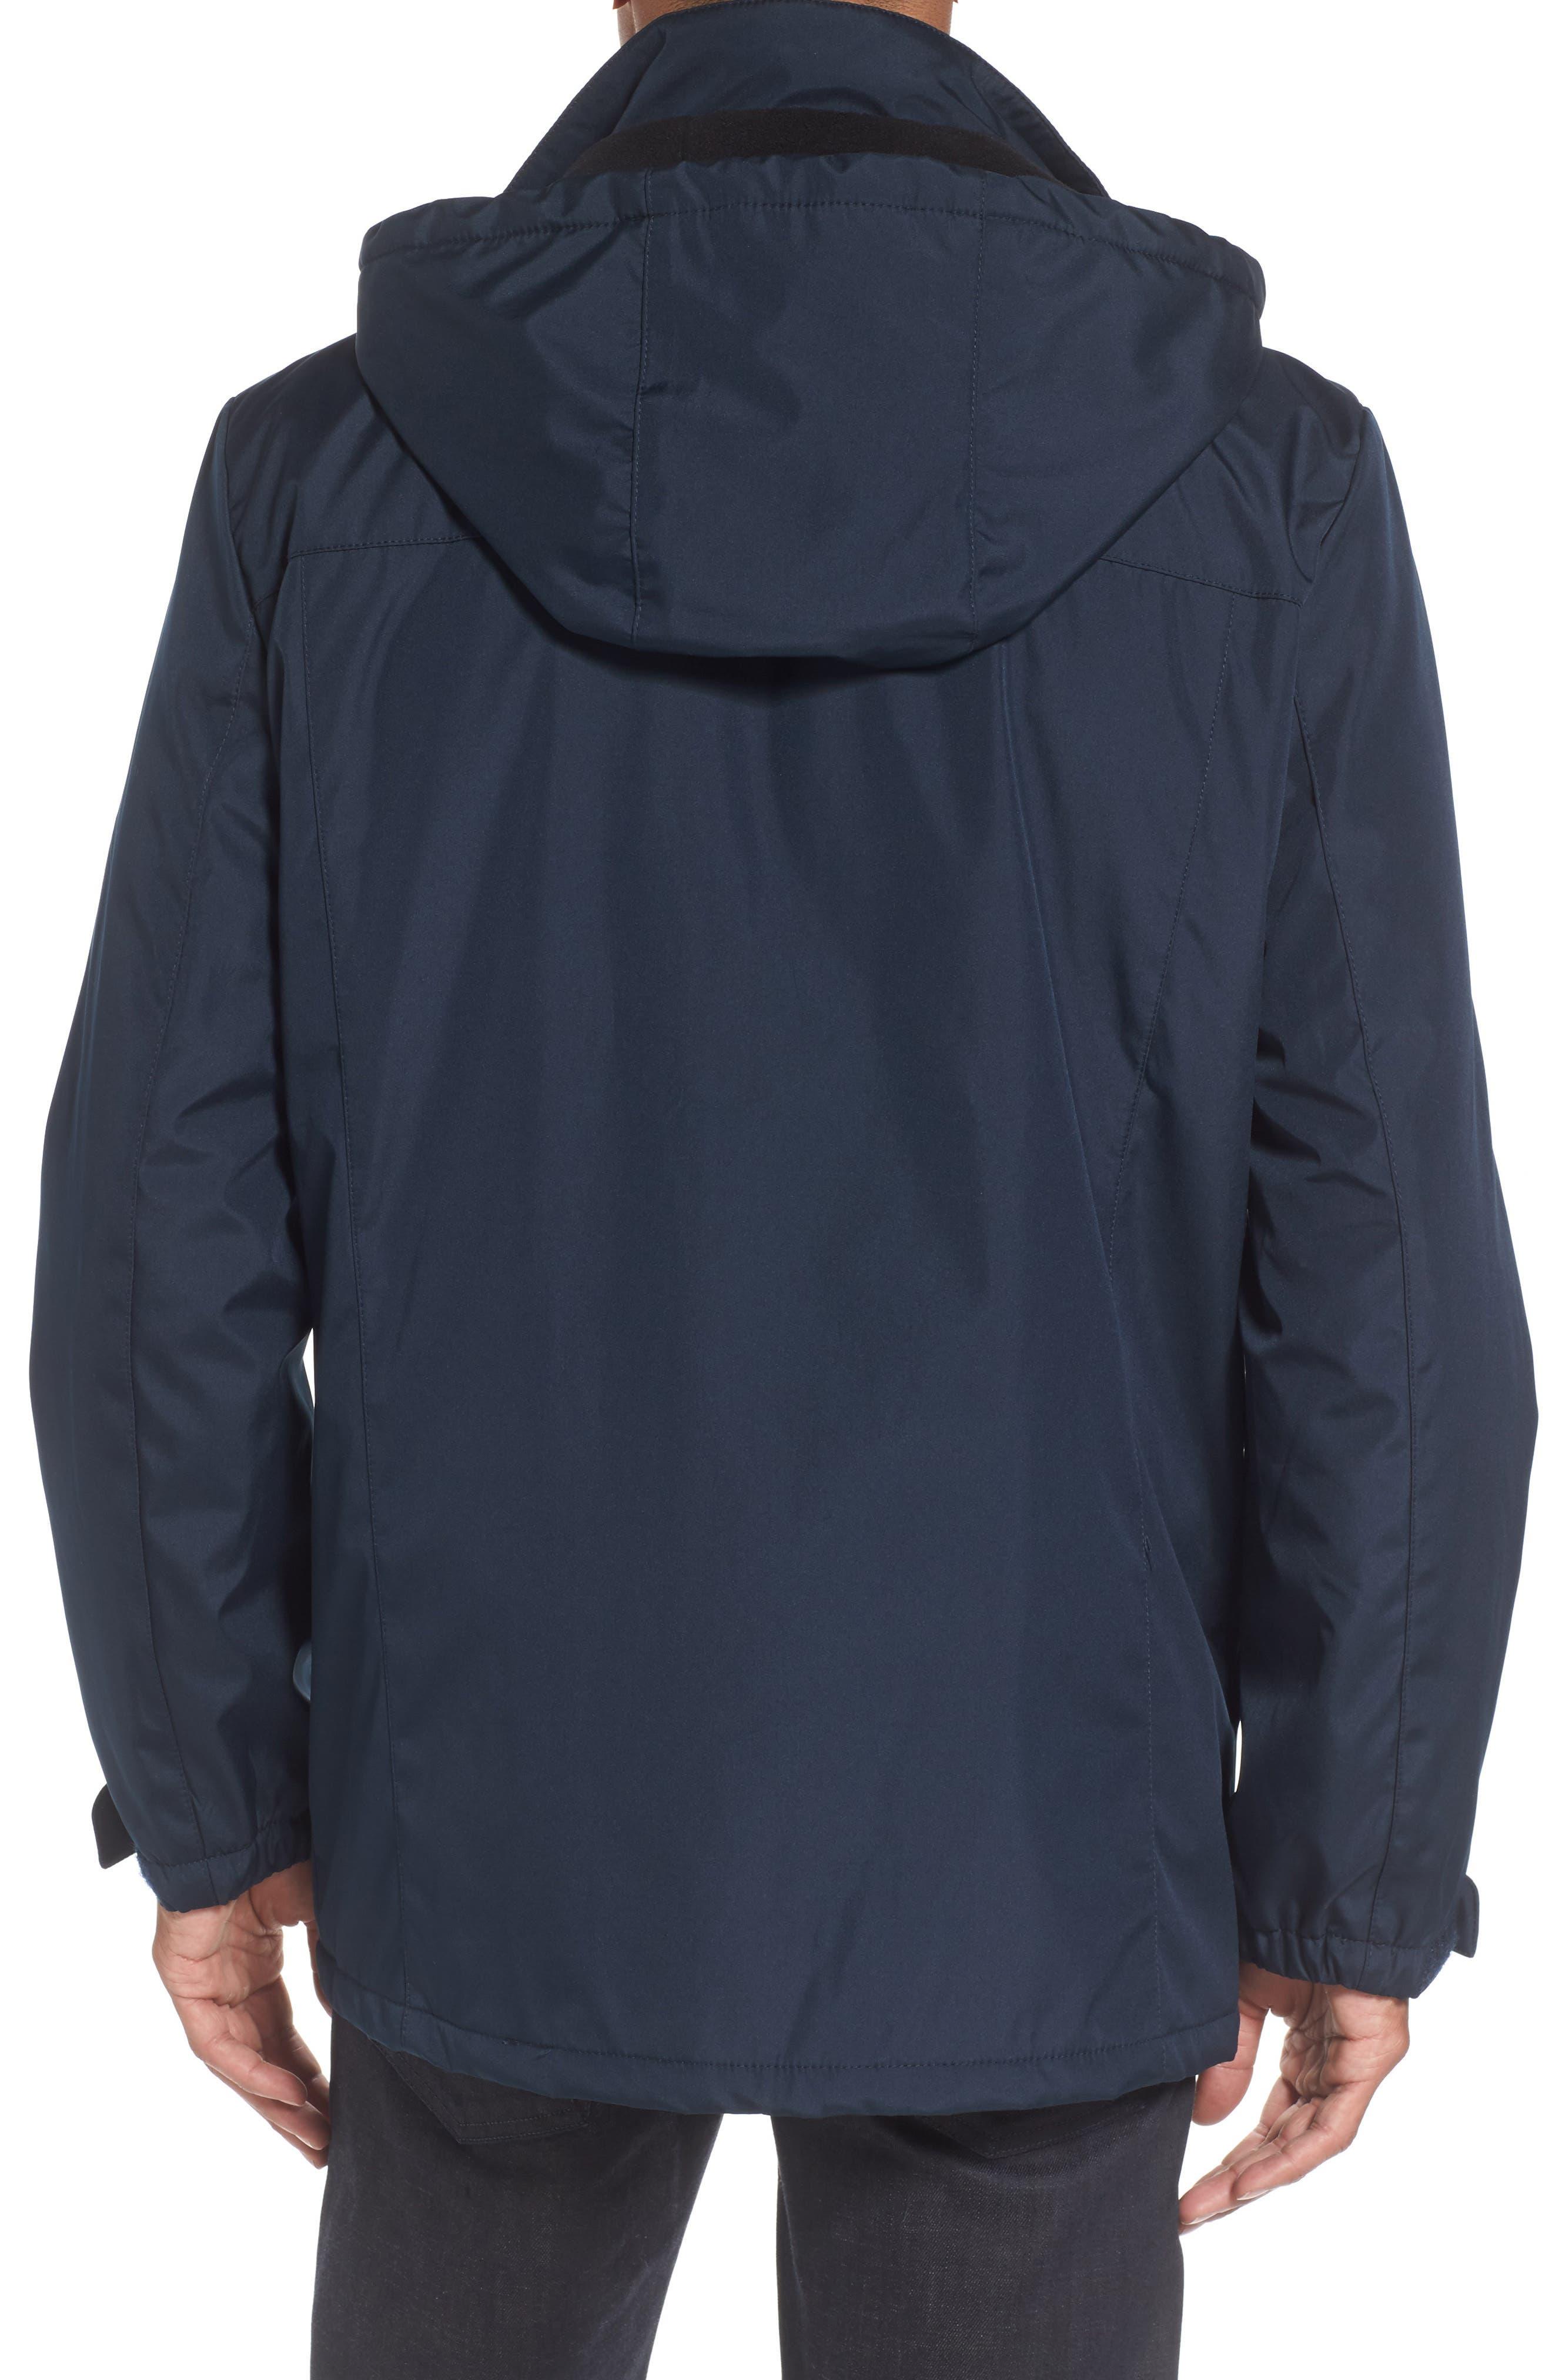 Hooded Jacket with Inset Fleece Bib,                             Alternate thumbnail 8, color,